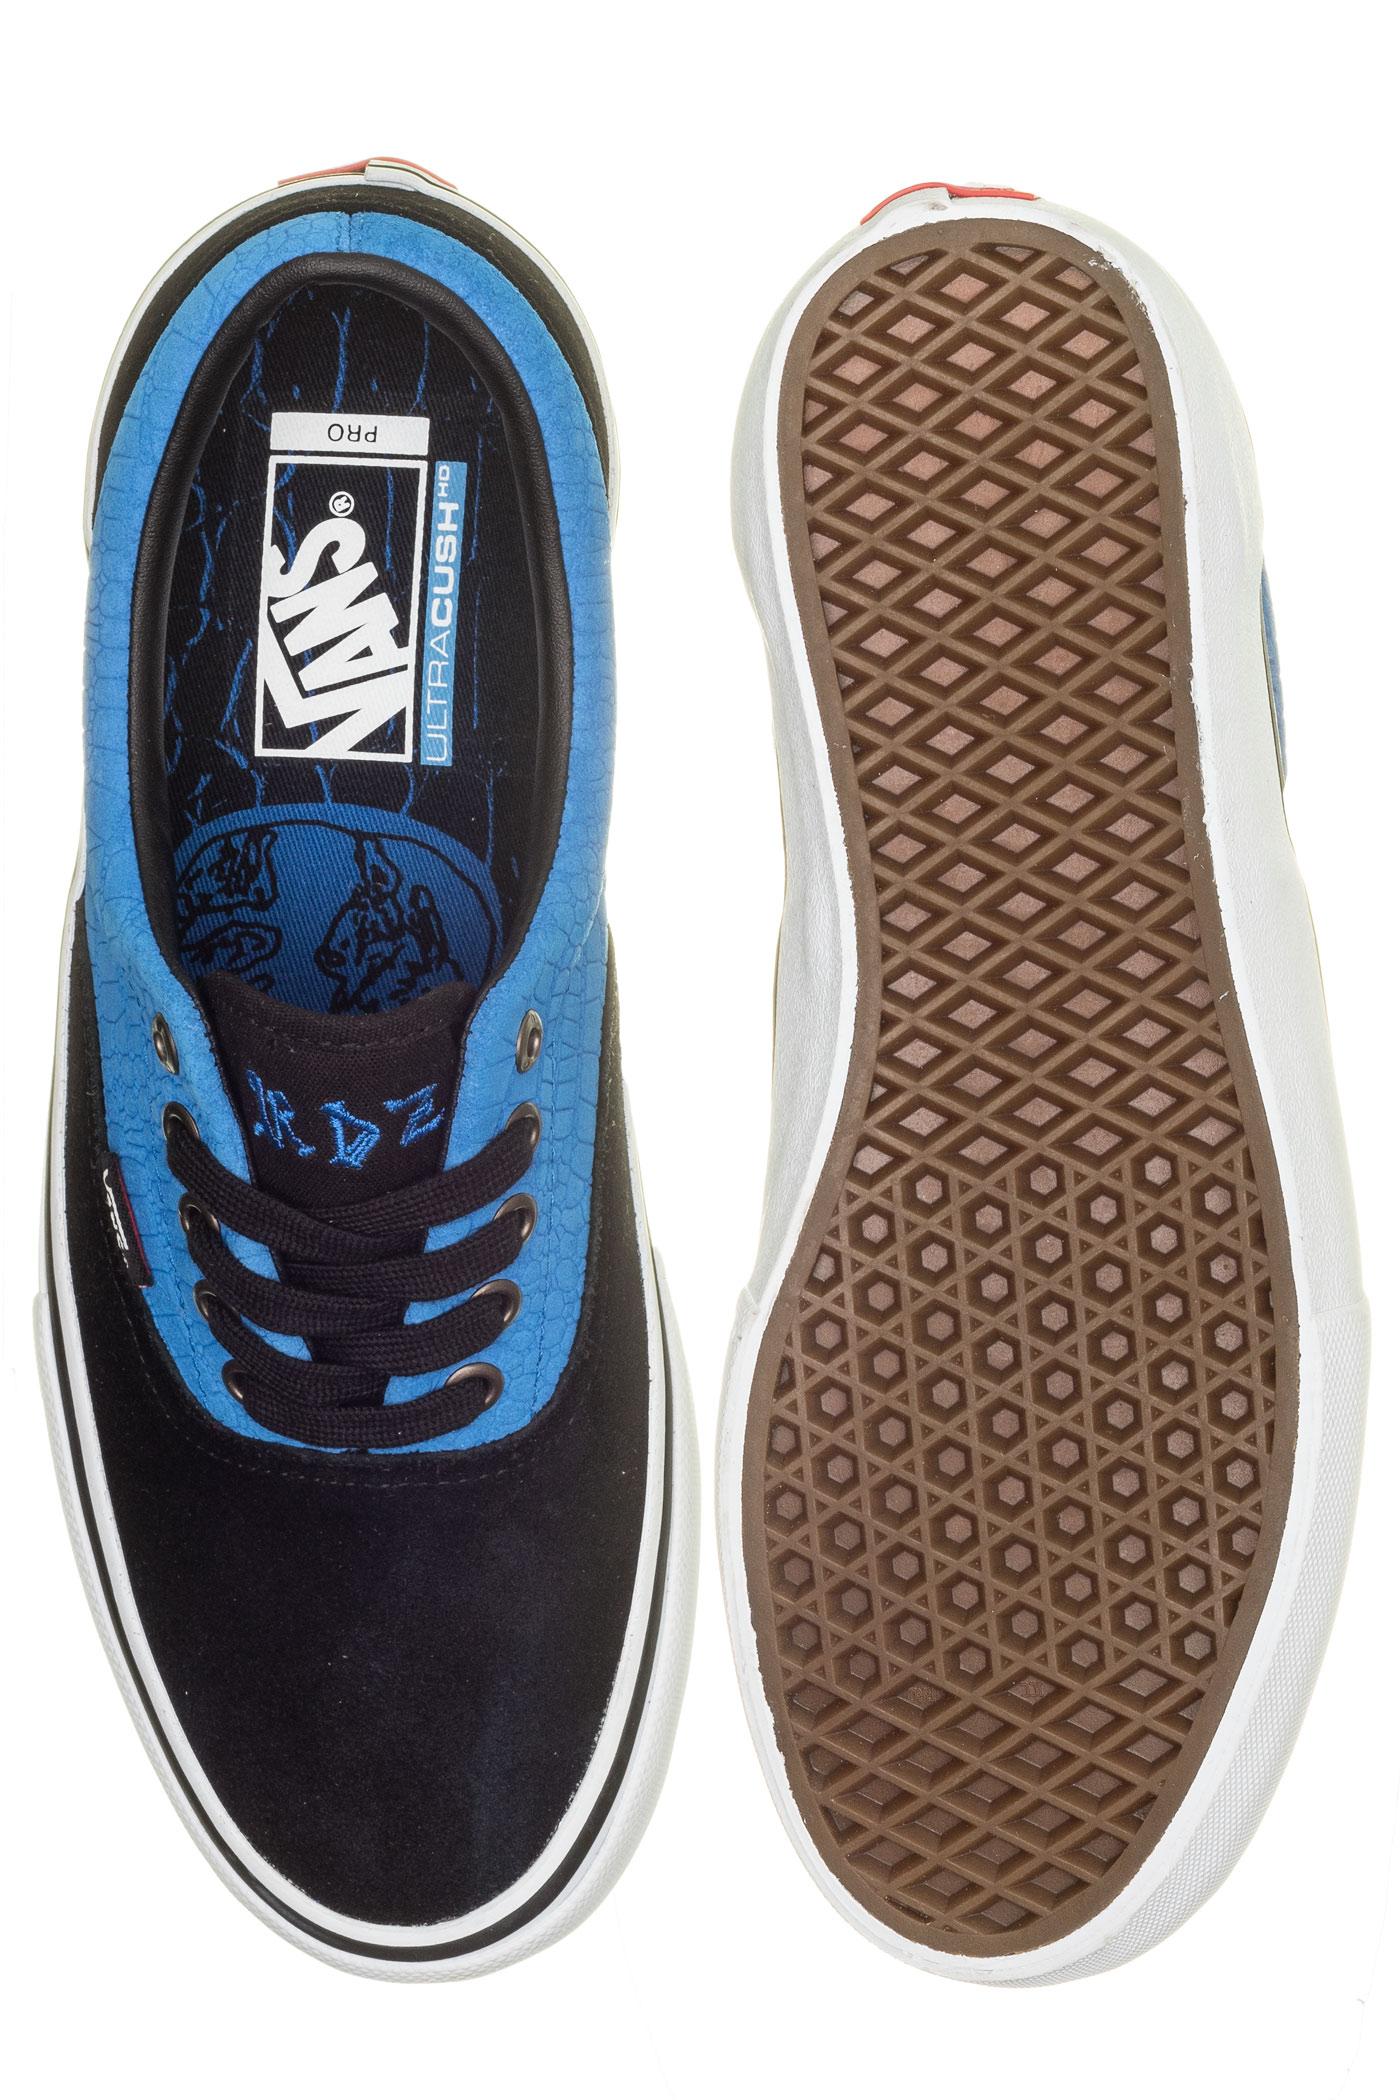 Rowan Zorilla Pro Vans Era Chaussureblack WDH9IEY2be